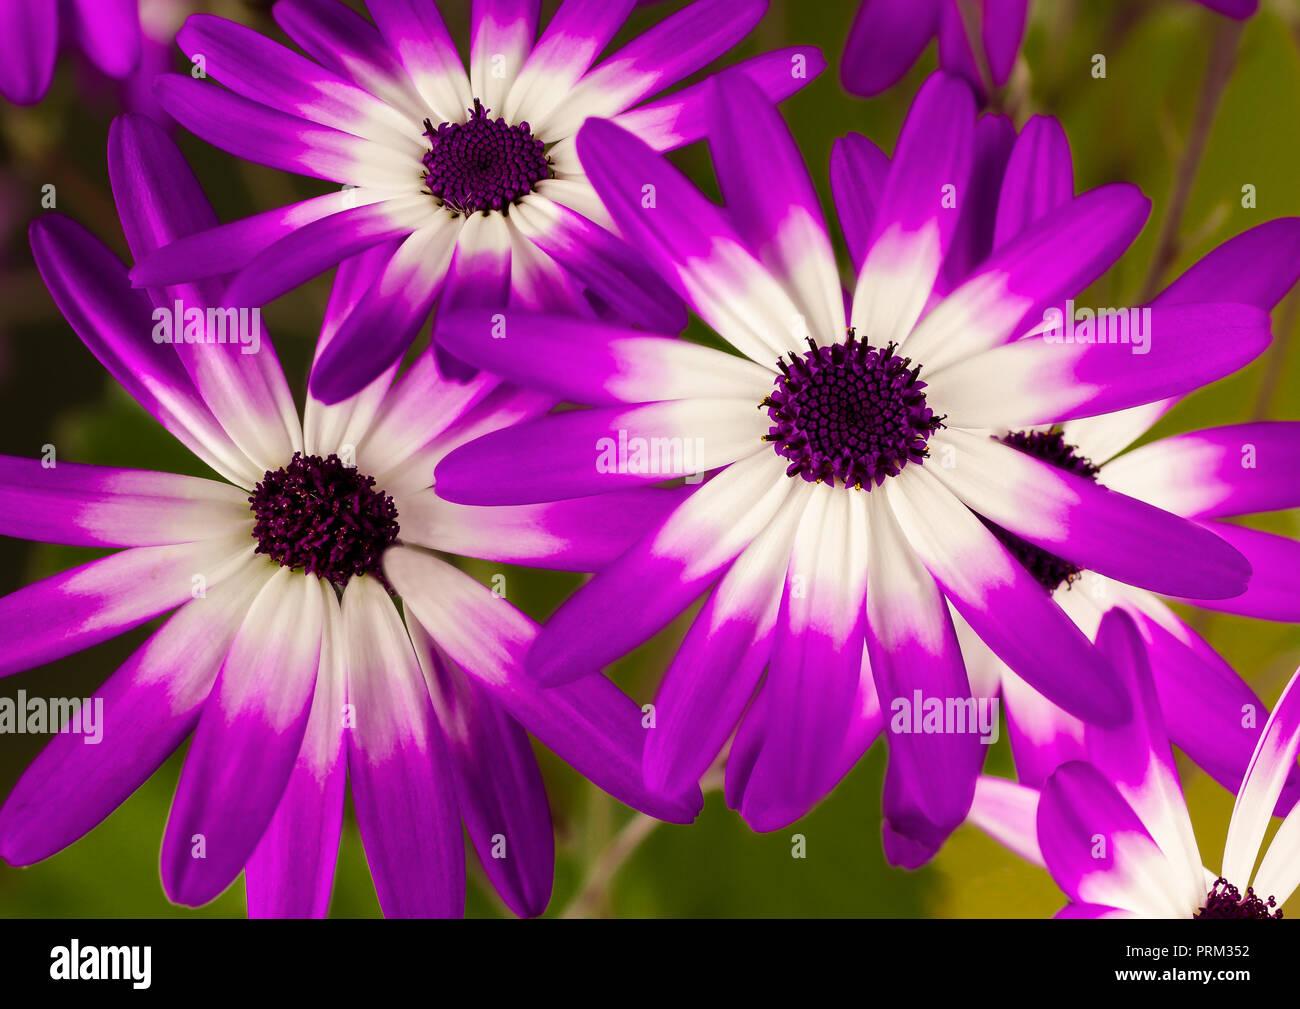 Senetti Trio flowers - Stock Image